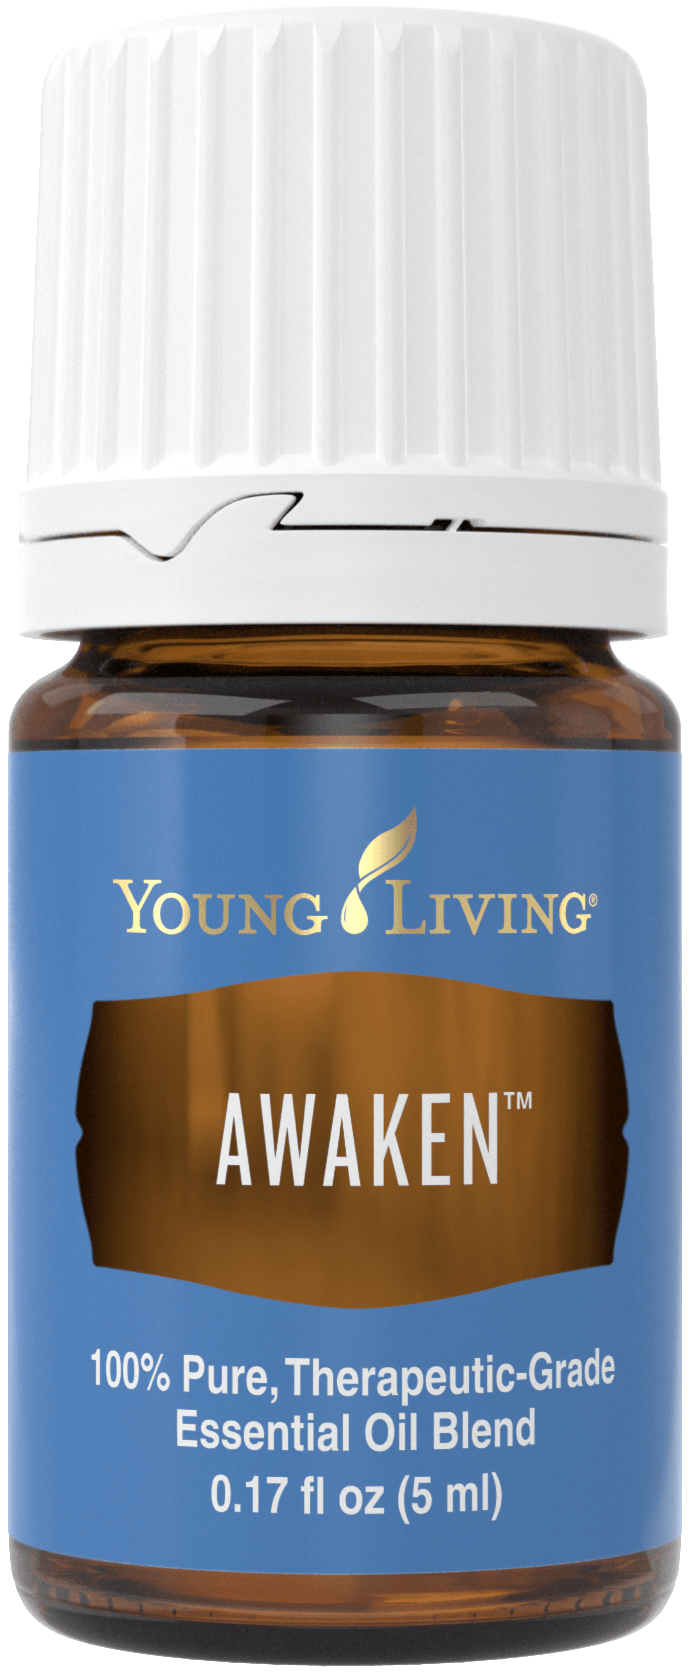 Ätherisches Öl Young Living: Awaken (Aufgewacht) 15ml